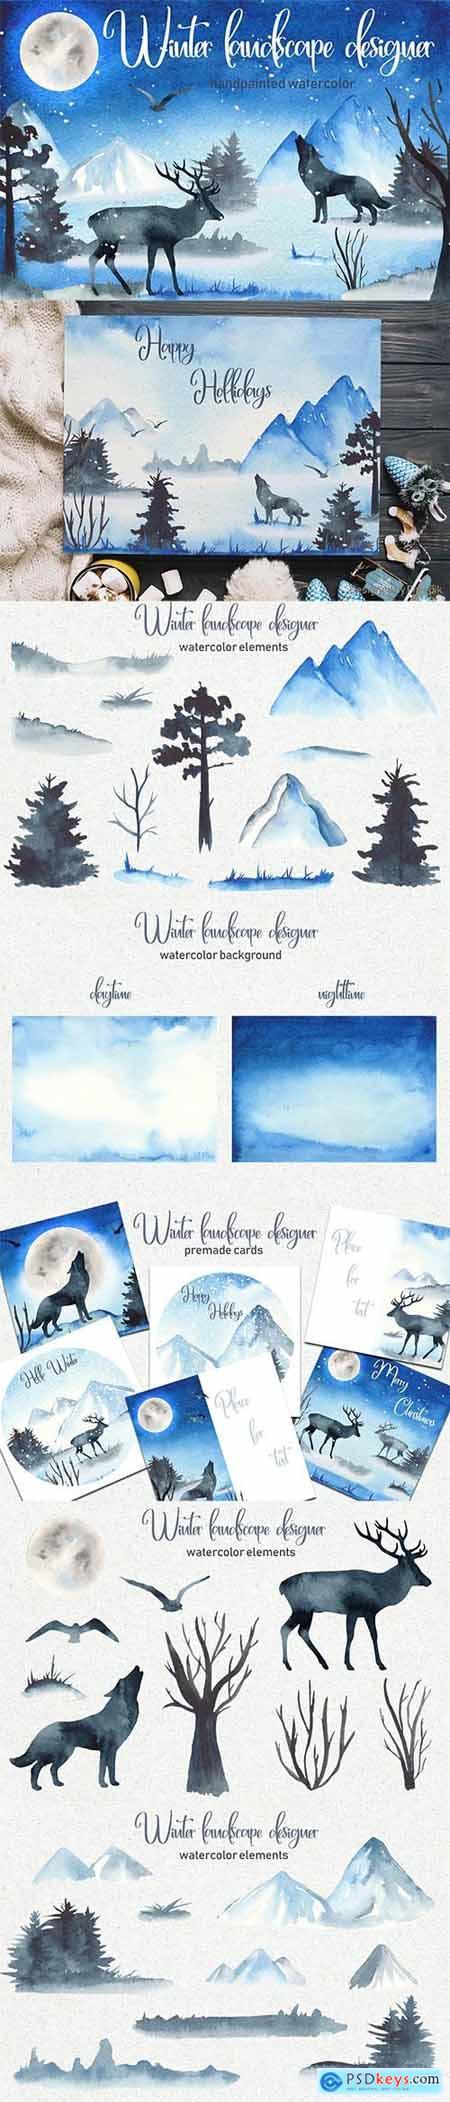 Watercolor Winter landscape designer